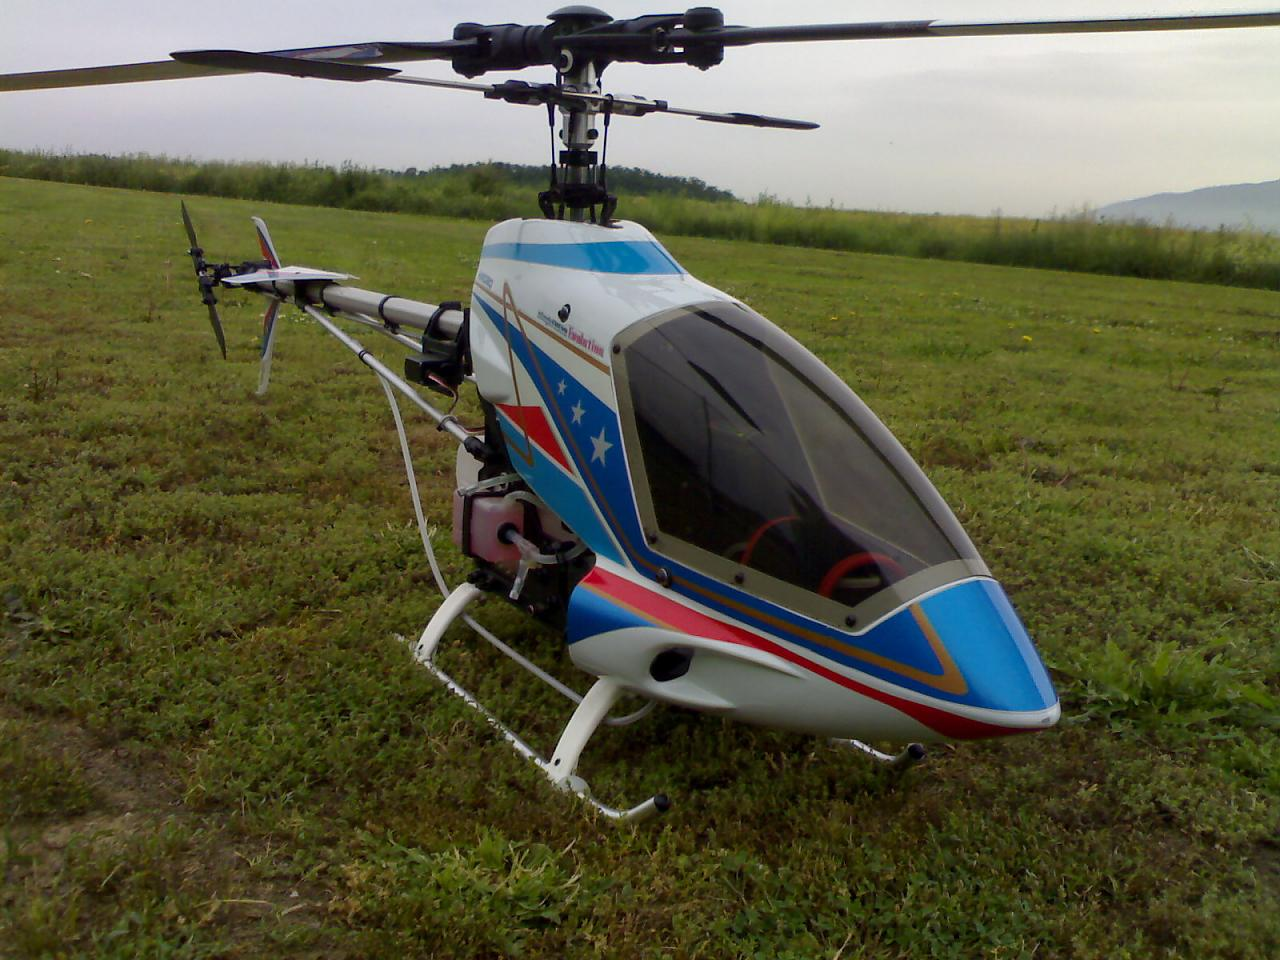 Elicottero 2 Posti Usato : Valutazione usato hirobo freya baronerosso